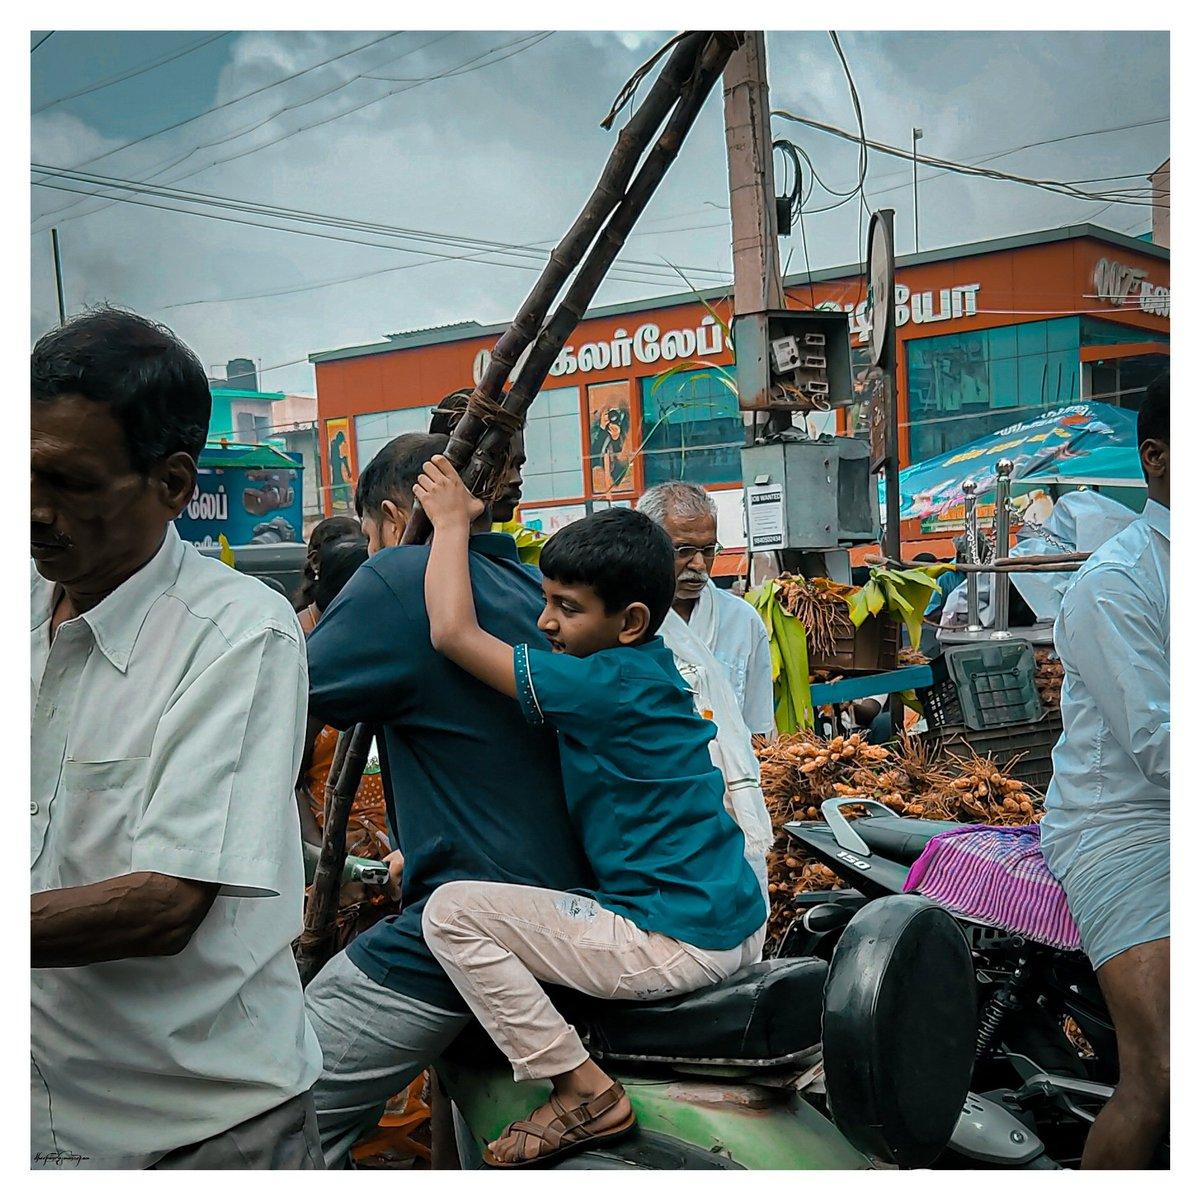 Father & Son, a messy bond, filial relationship👨👦 Moment caught while I'm purchasing with my Appa. #வழிப்போக்கன் #fatherson #vintage #Scooter   #streetsoftamilnadu #streetsofindia #Pongal #perambalur #TamilNadu #India @RedmiSupportIN #note9pro  @Lightroom  #dheepanmanickam